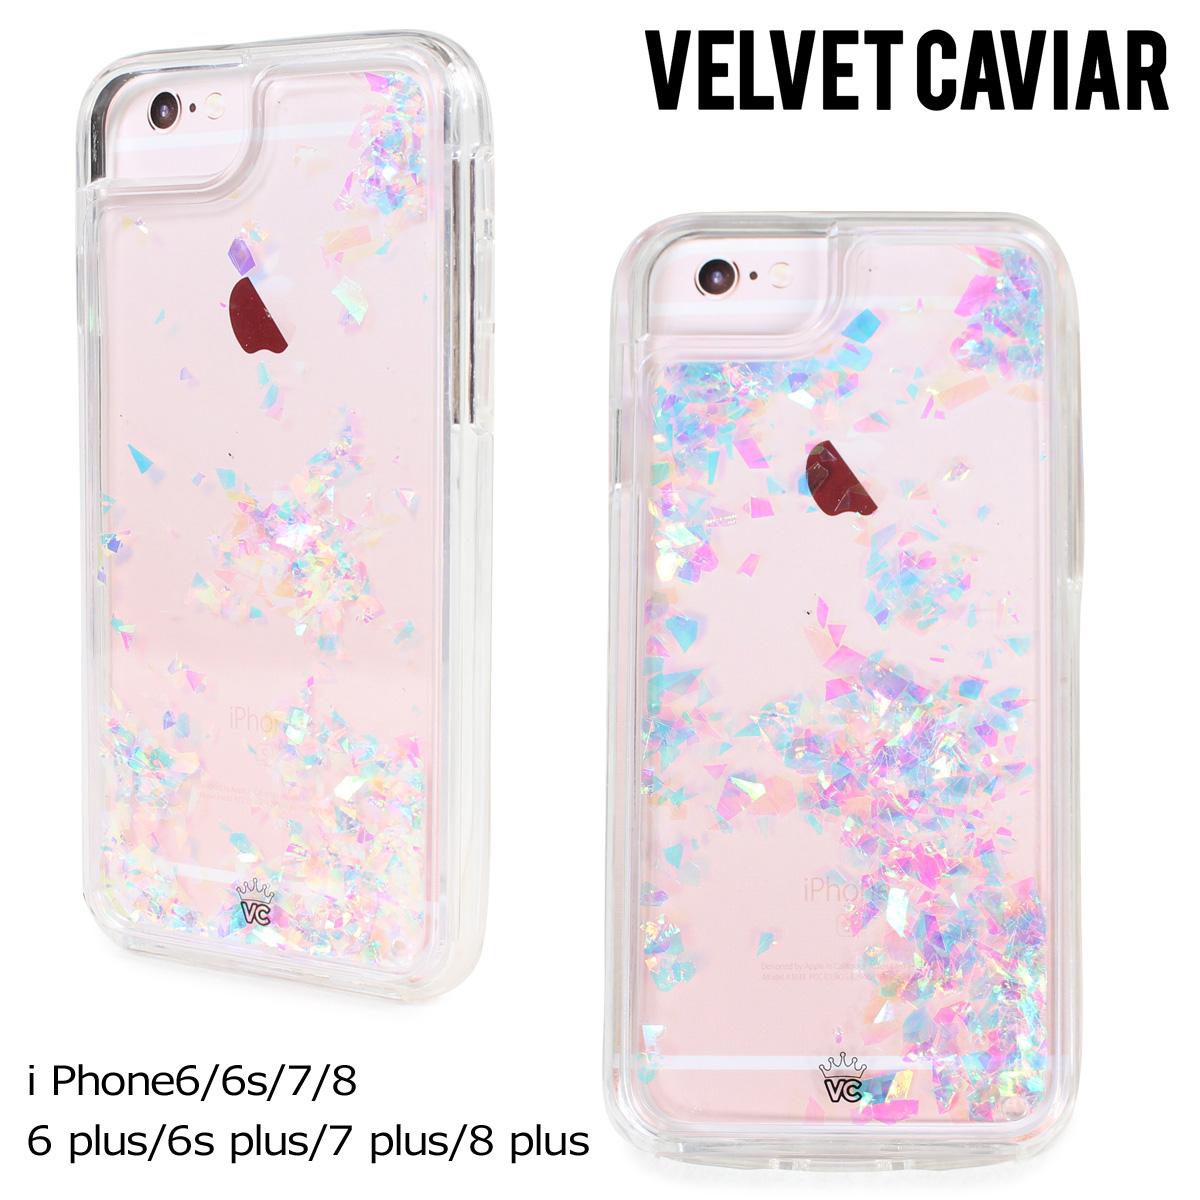 new product ba8f6 f5c59 Velvet Caviar FLAKES DUAL IPHONE CASE velvet caviar iPhone8 iPhone7 8 Plus  7Plus 6s six cases smartphone iPhone case eyephone iPhone velvet Lady's ...